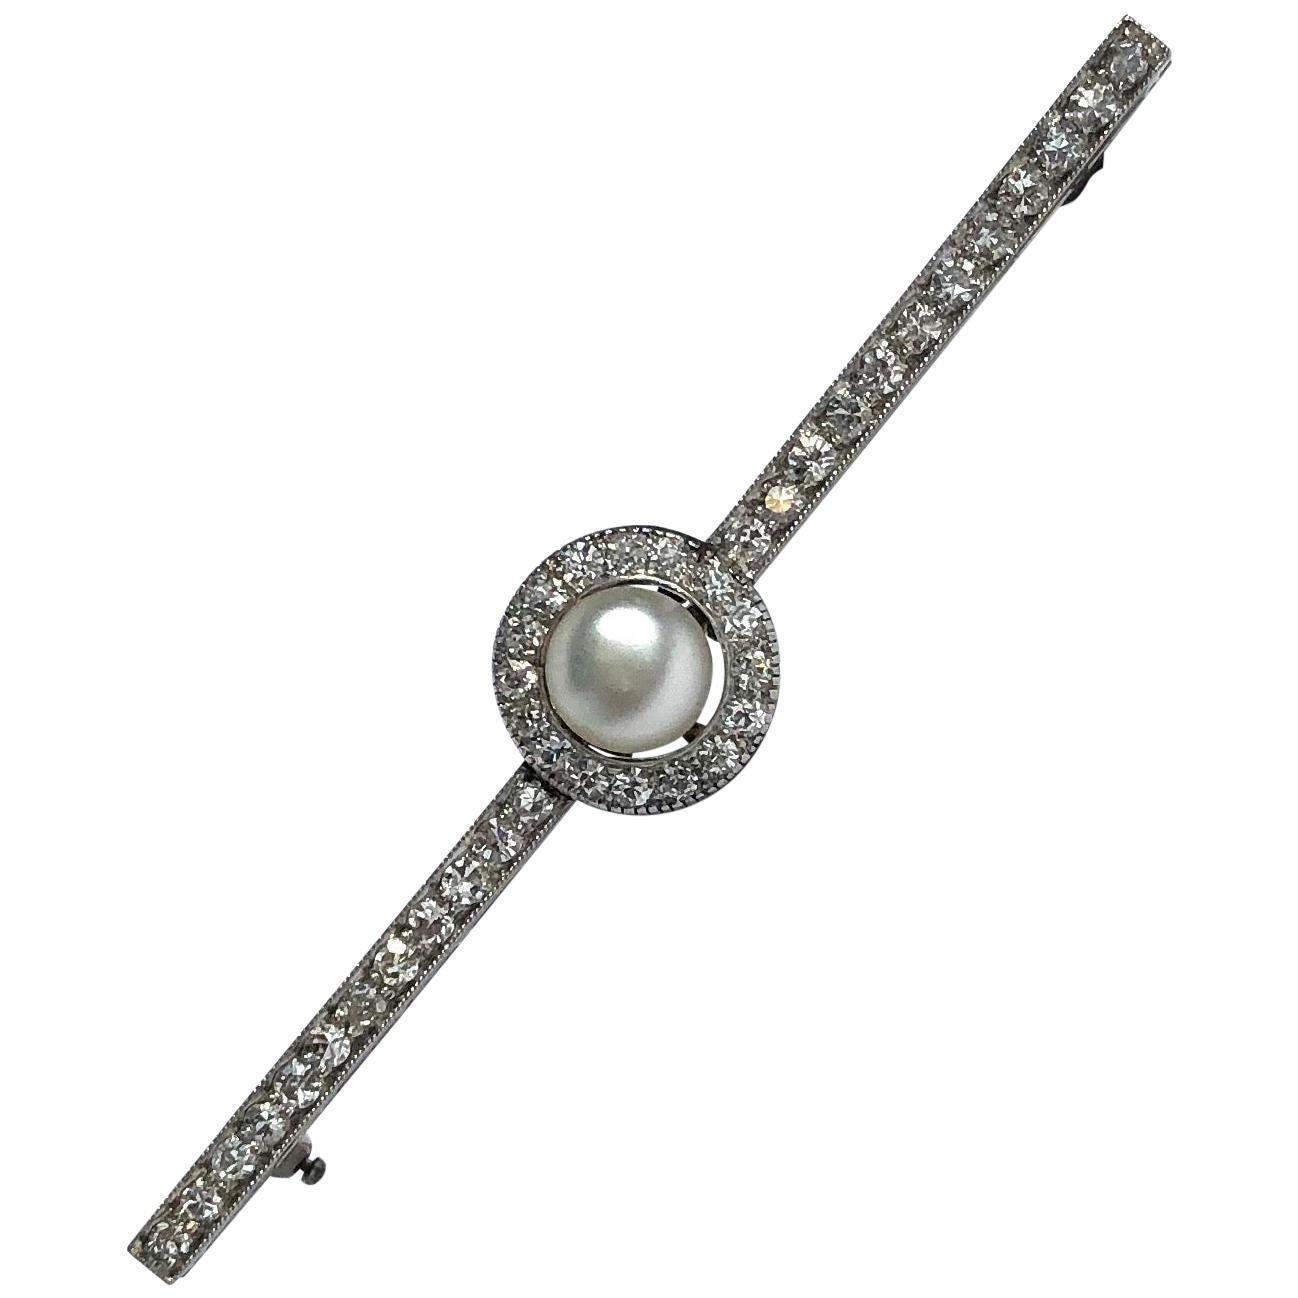 Edwardian Diamond and Pearl 18 Carat White Gold Bar Brooch